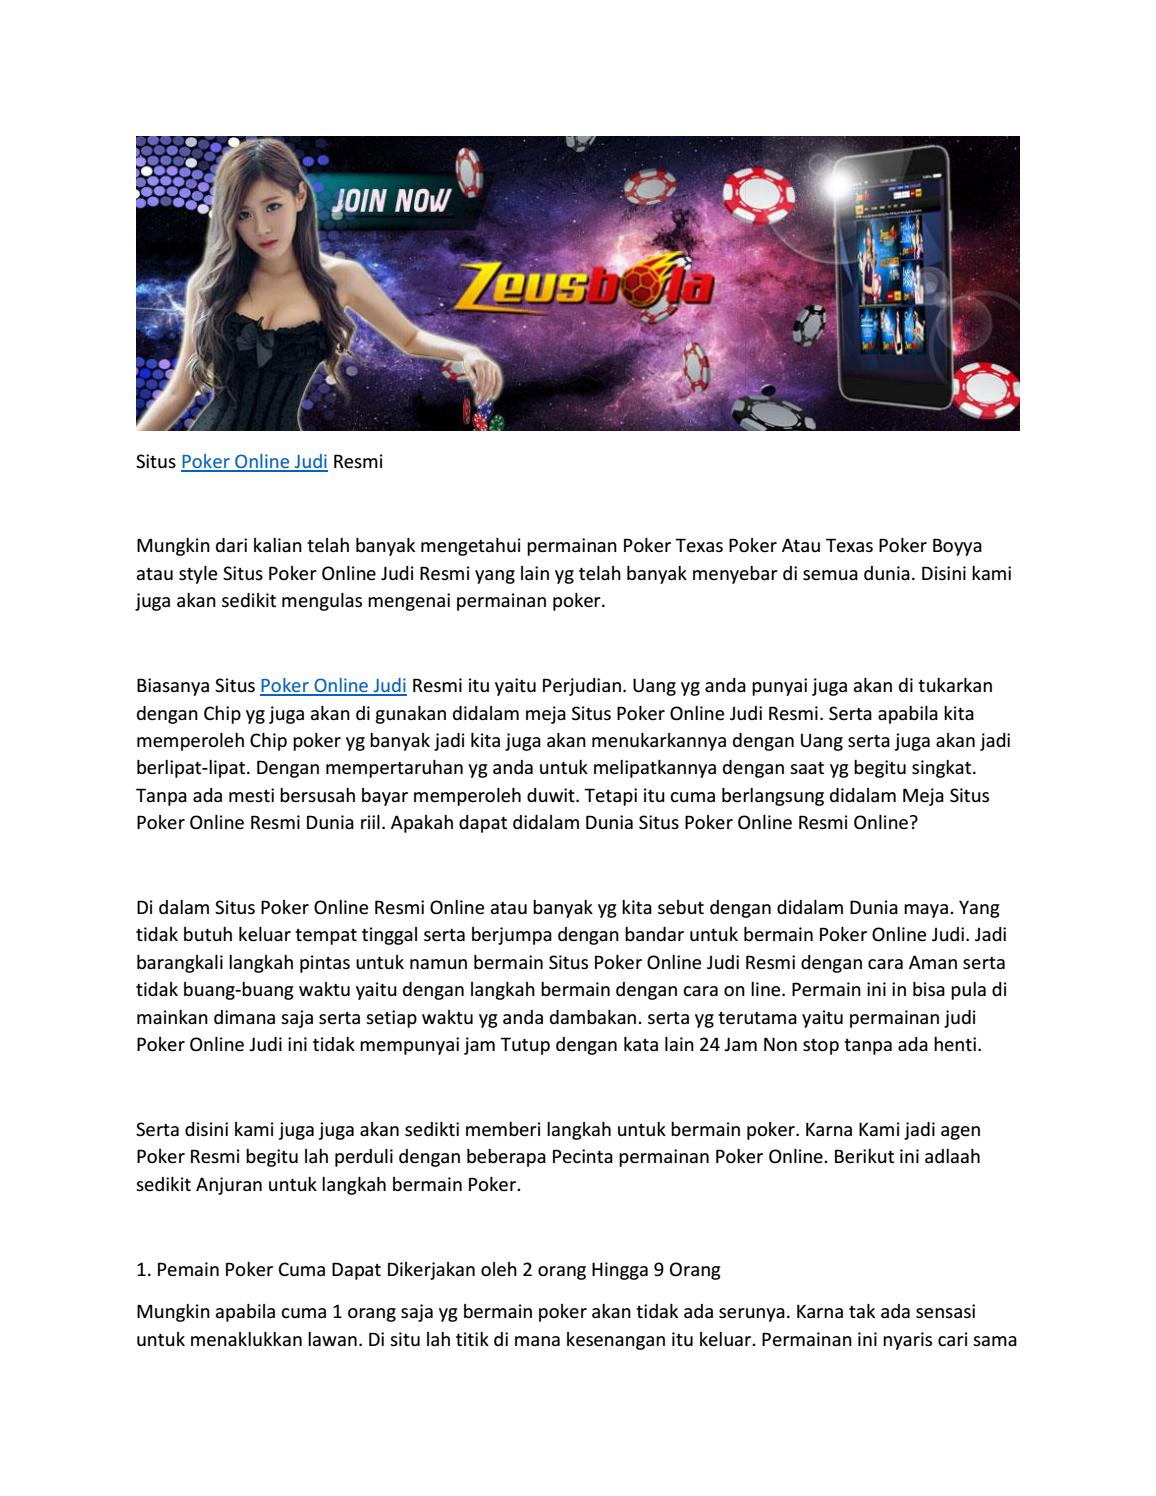 Situs Poker Online Judi Resmi By Raja Burung Issuu